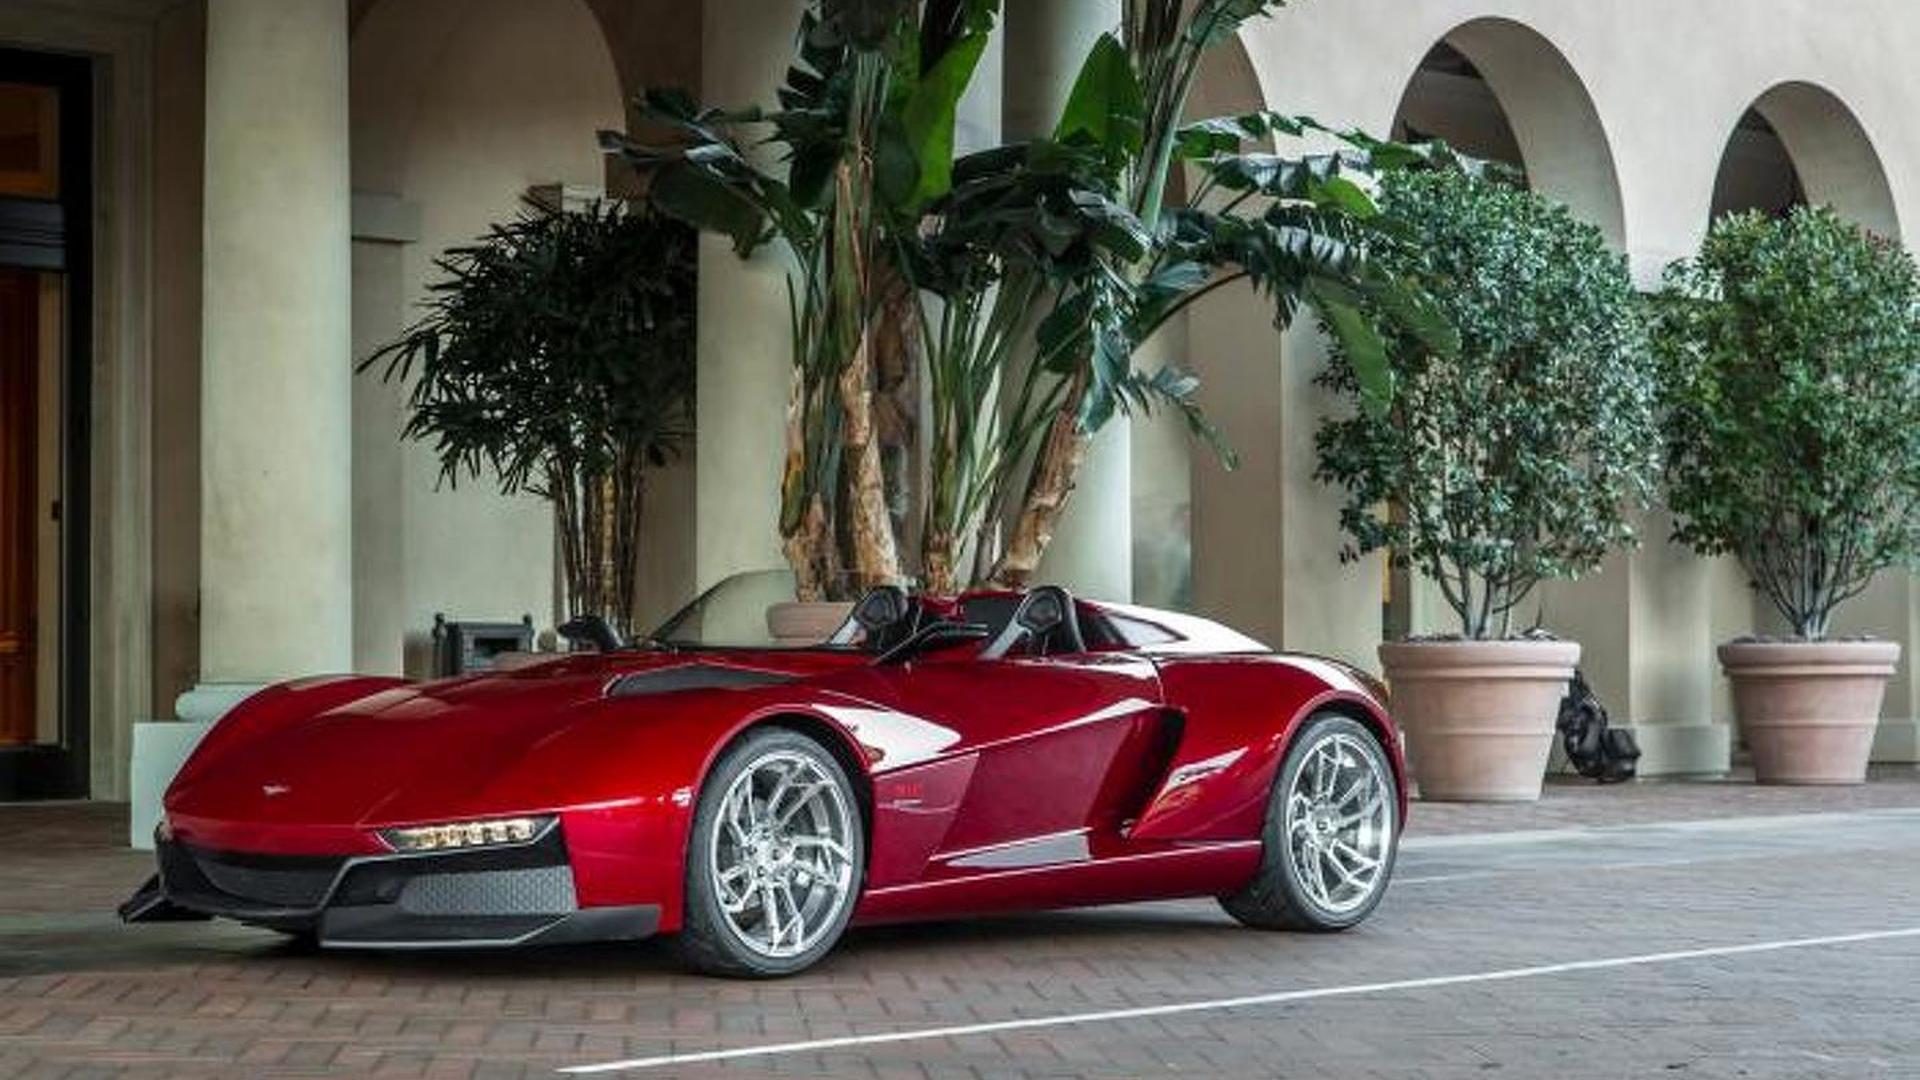 Rezvani Beast Speedster unveiled with 300 bhp